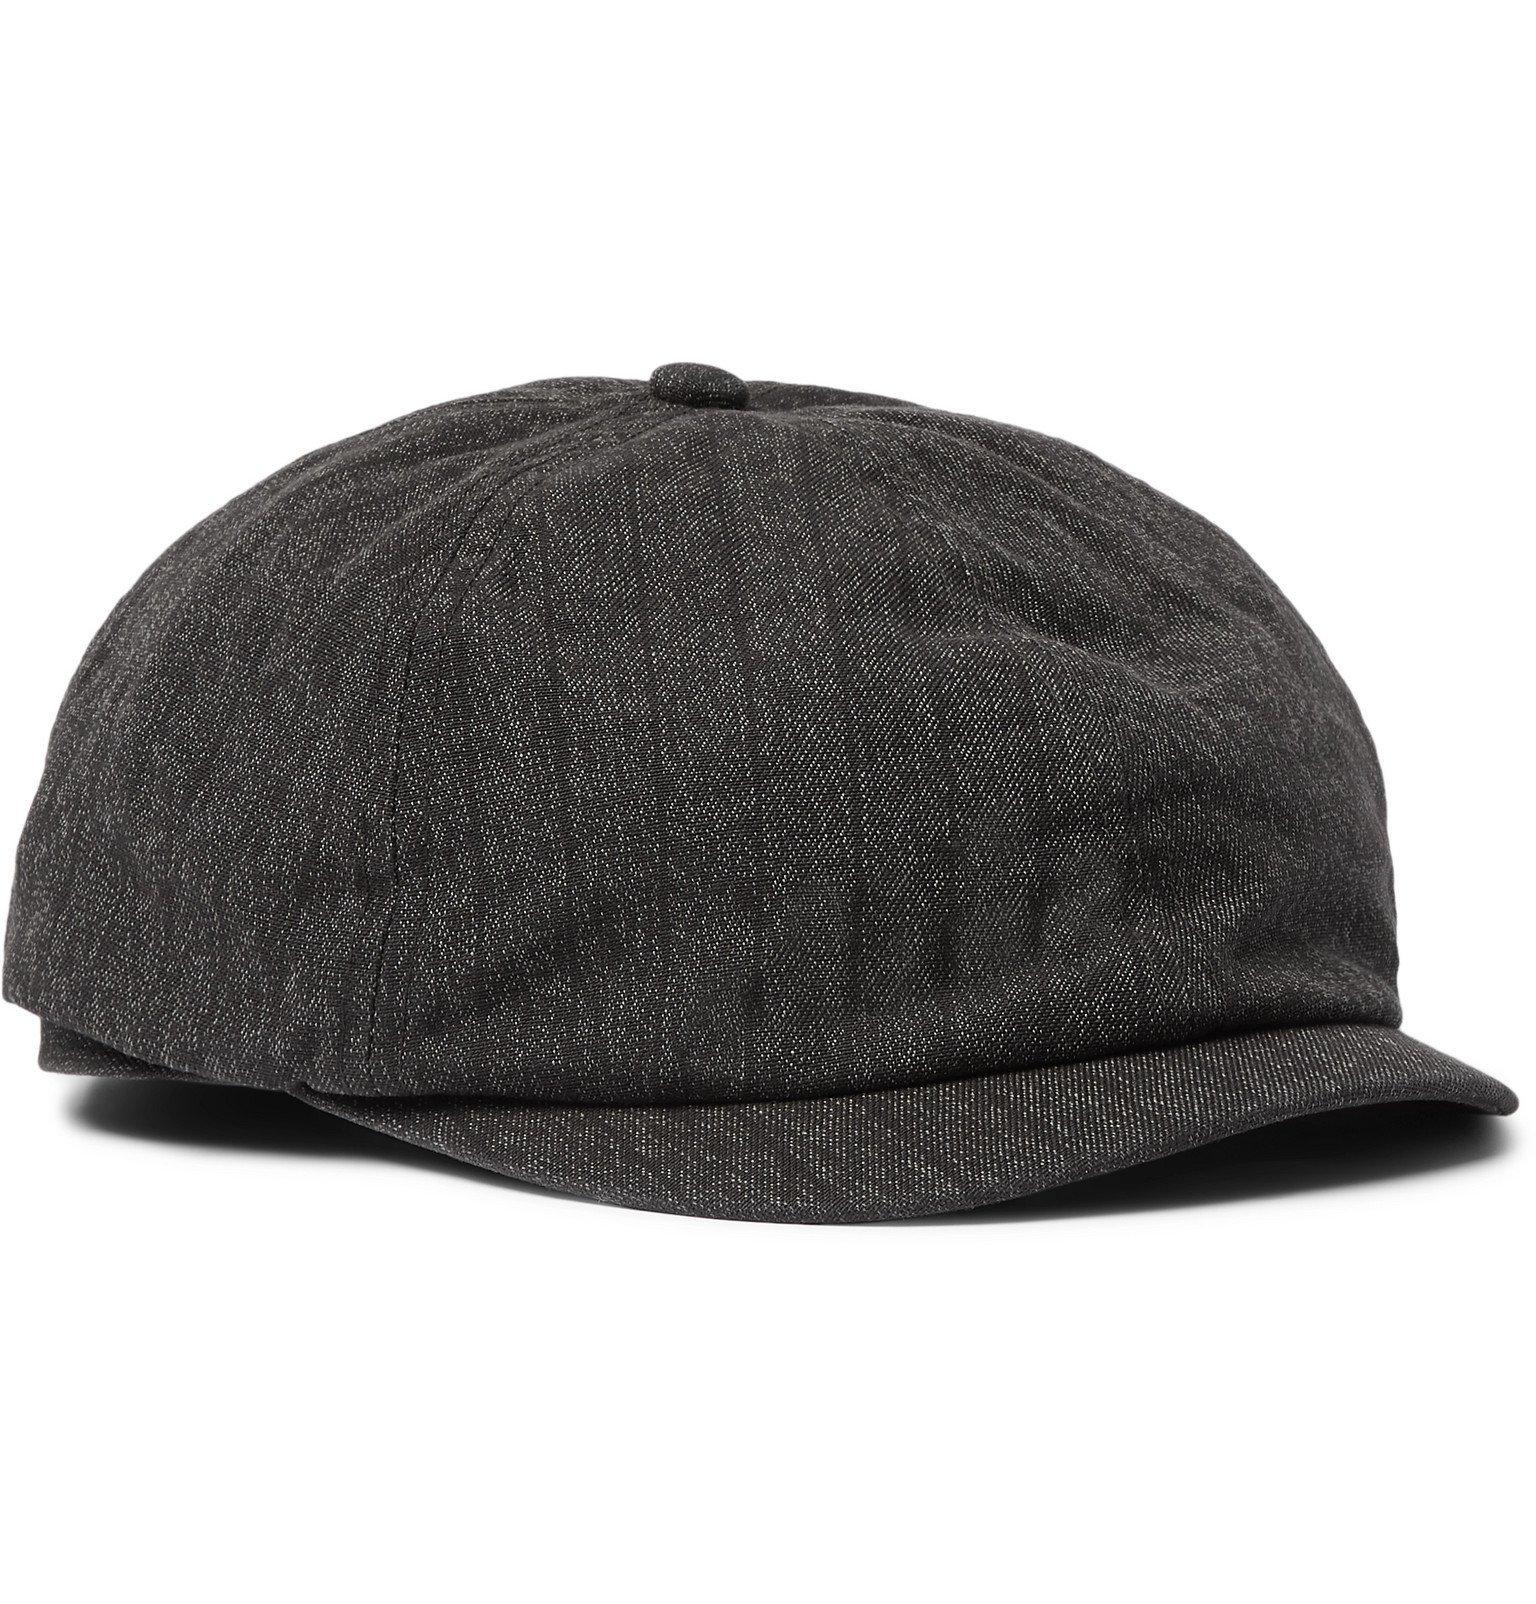 RRL - Cotton Flat Cap - Black